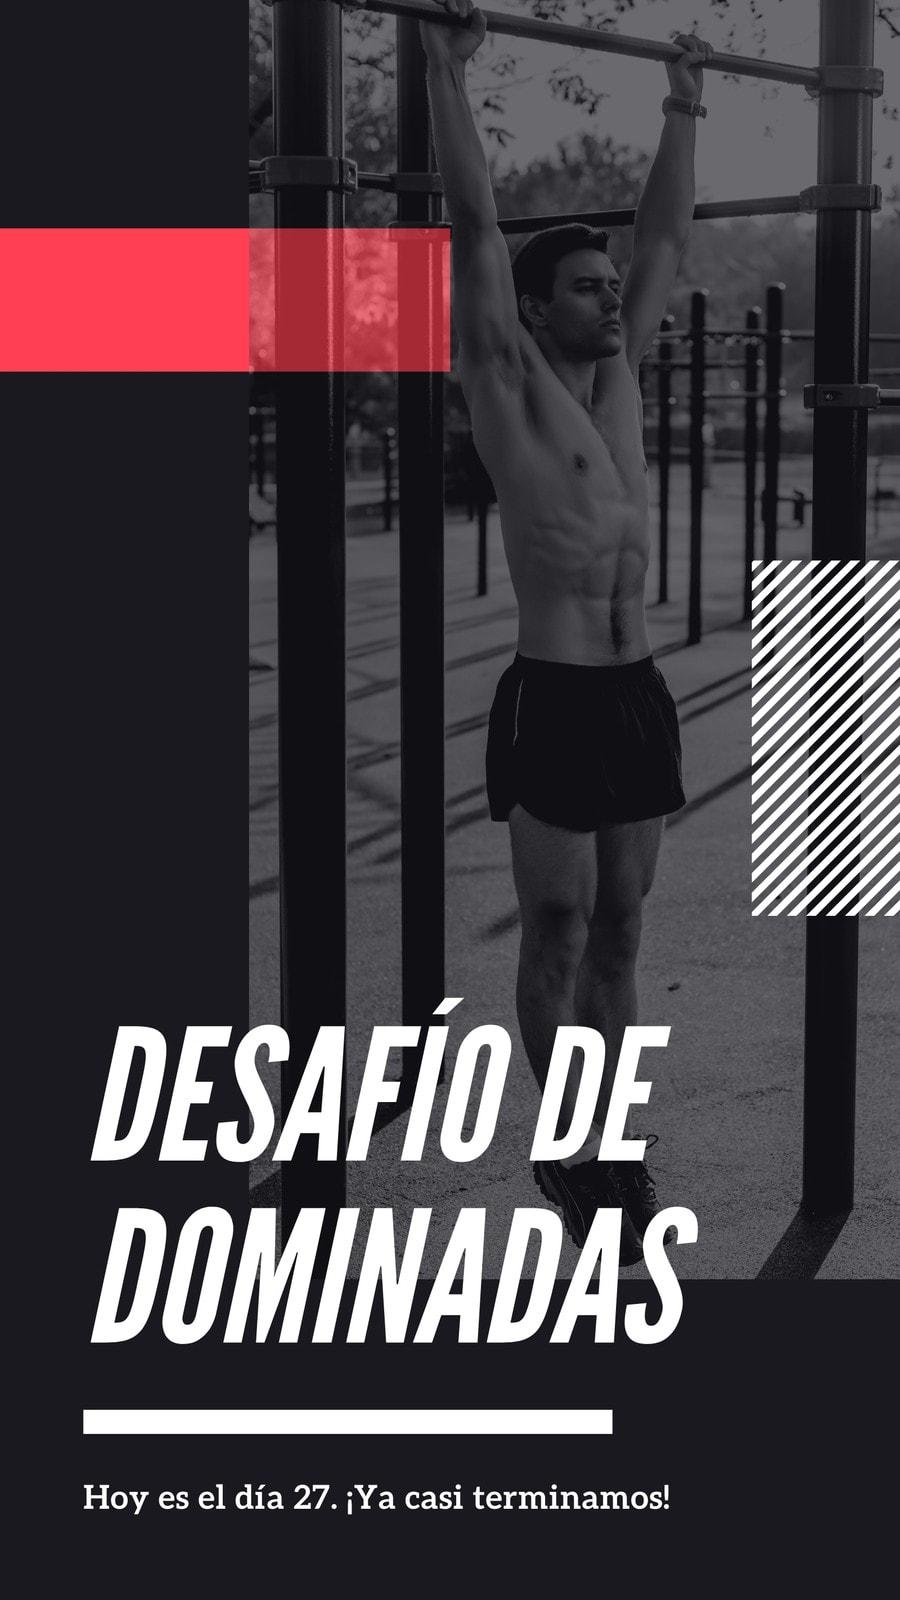 Negro Rojo Rayas Fitness Influencer Asimétrico Historia Instagram Conjunto